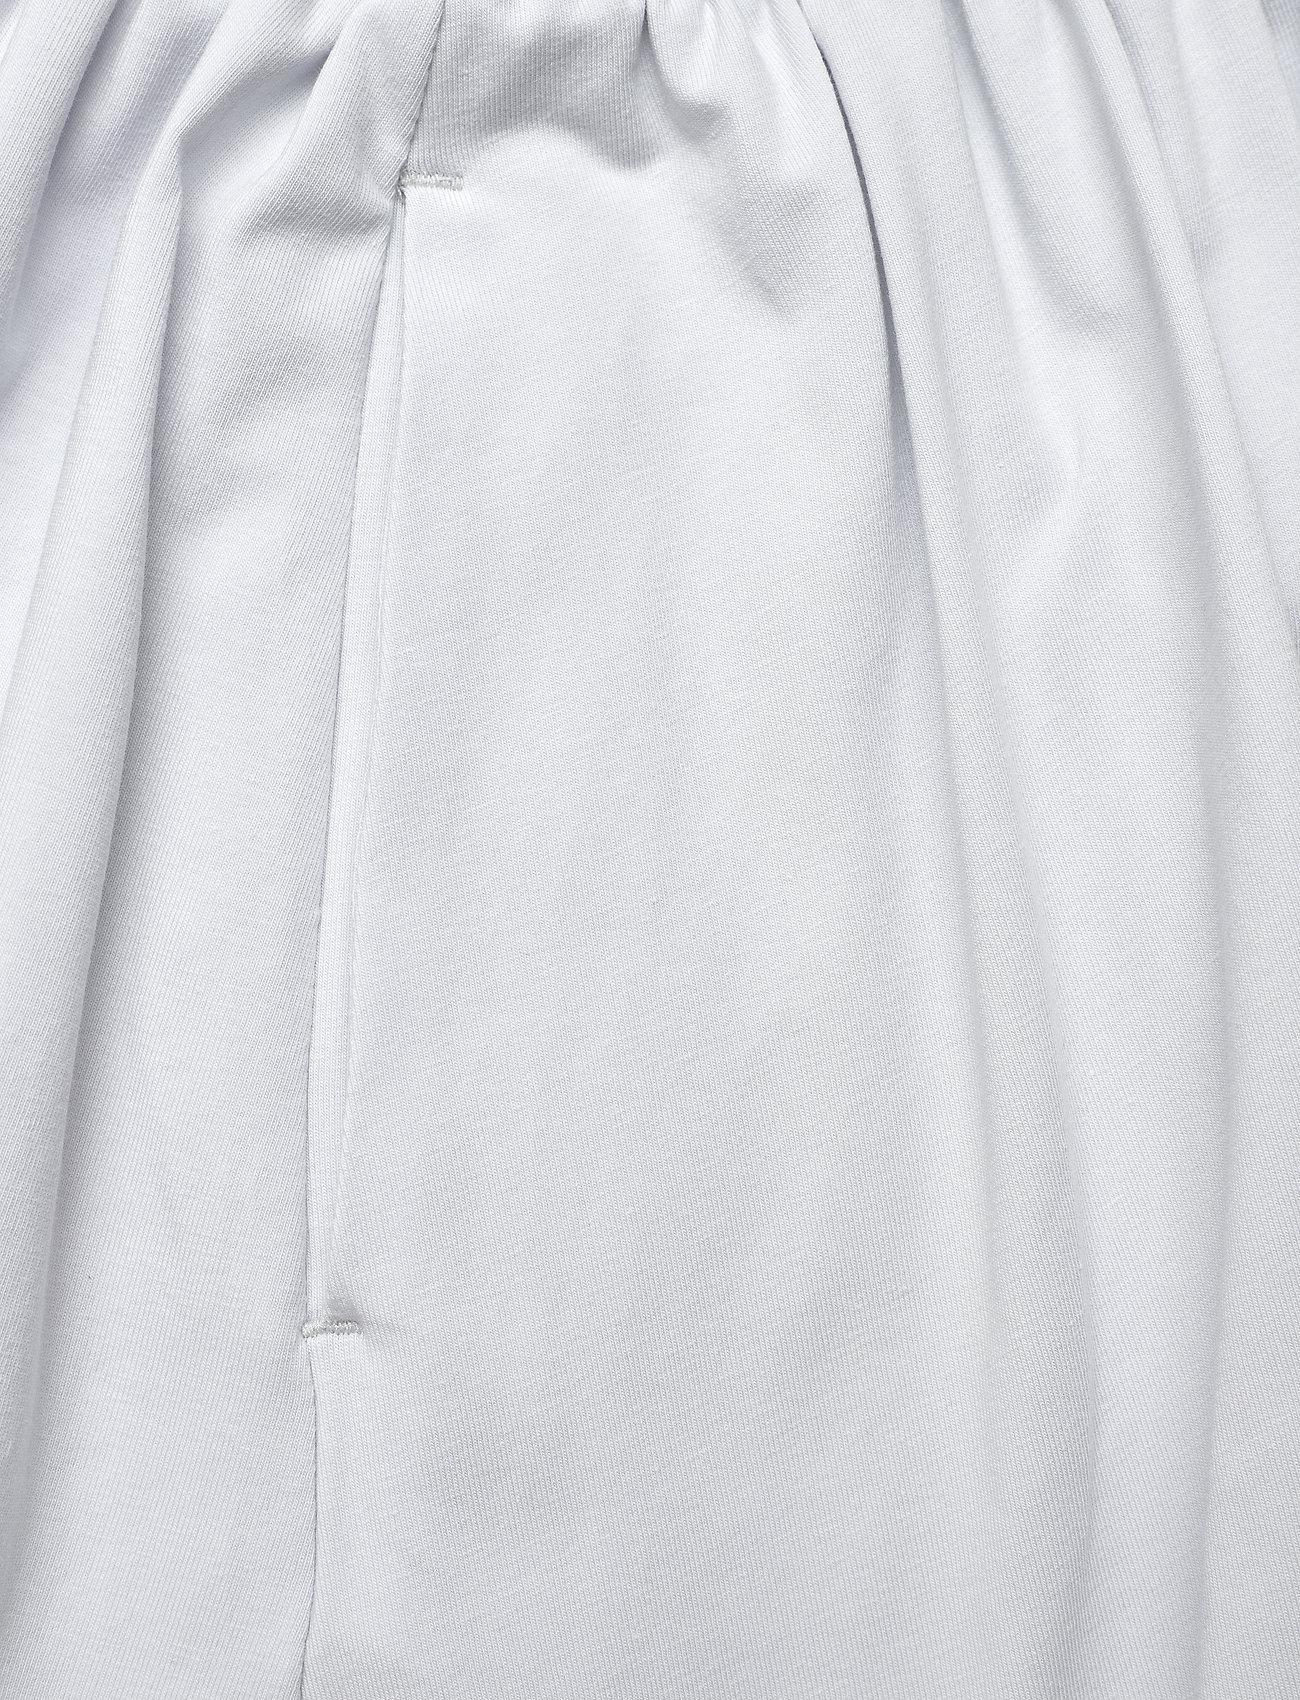 Max Mara Leisure - RADAR - midi skirts - light grey - 2